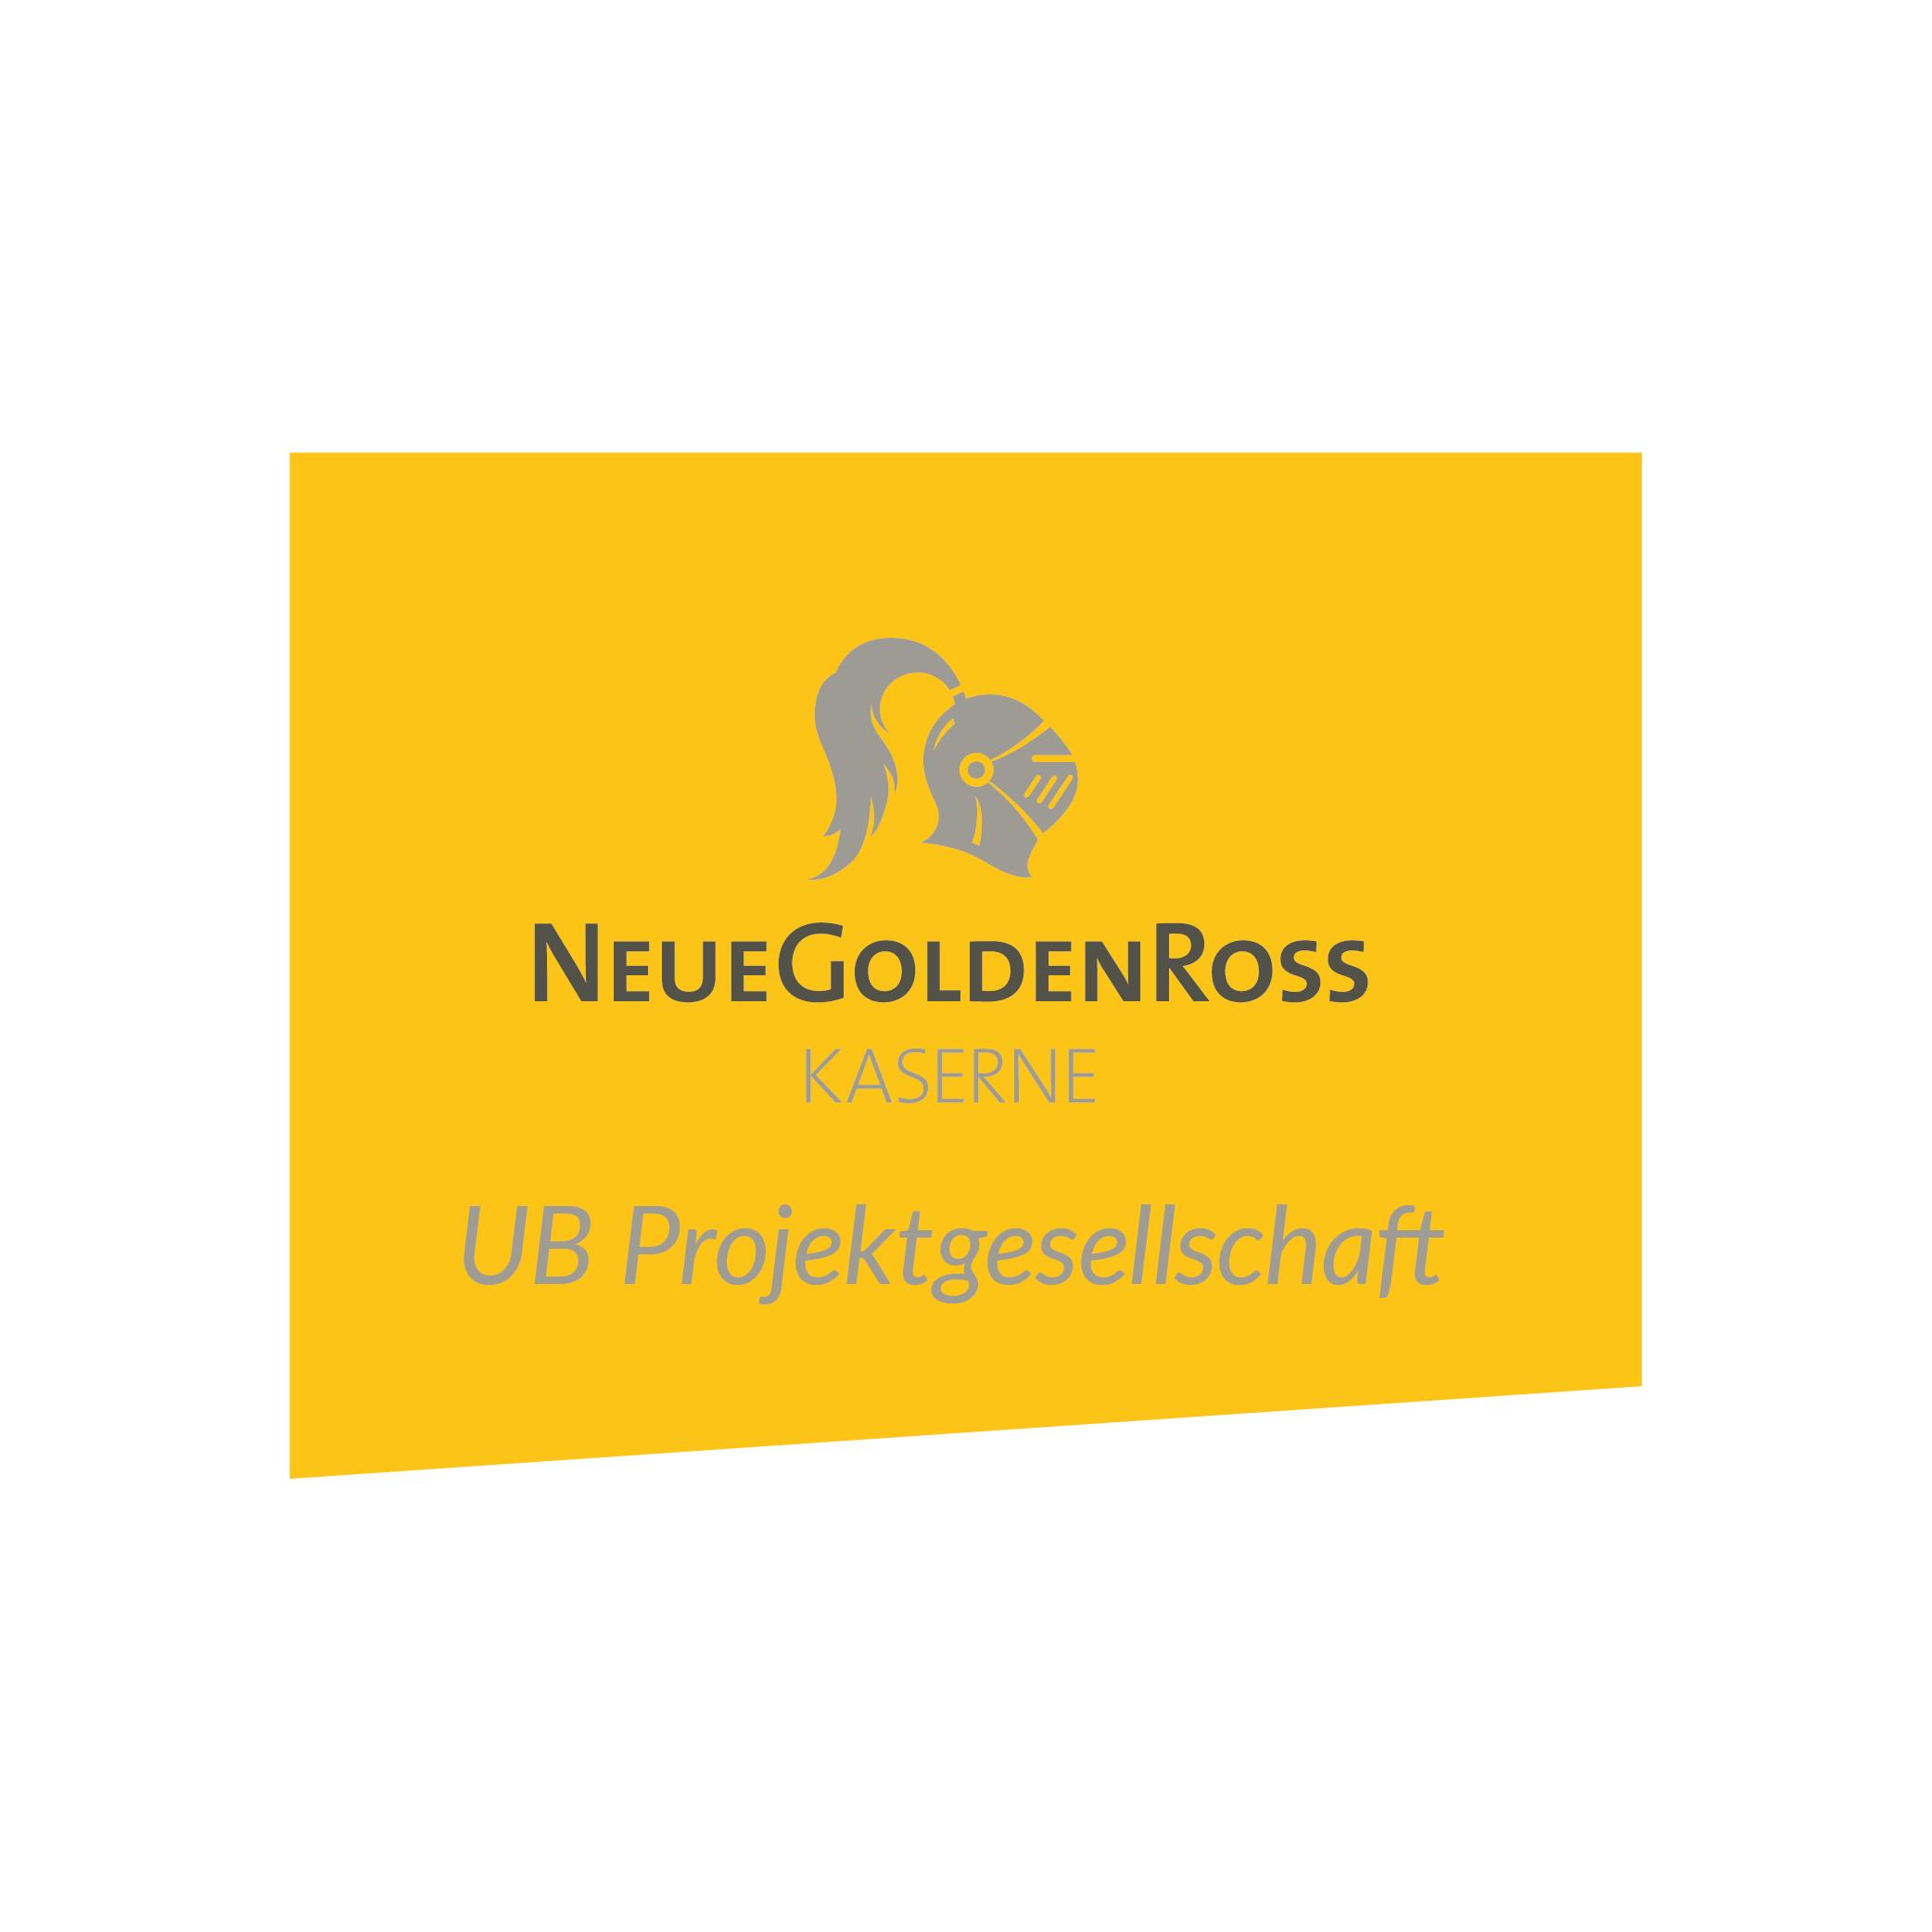 UB Projektgesellschaft